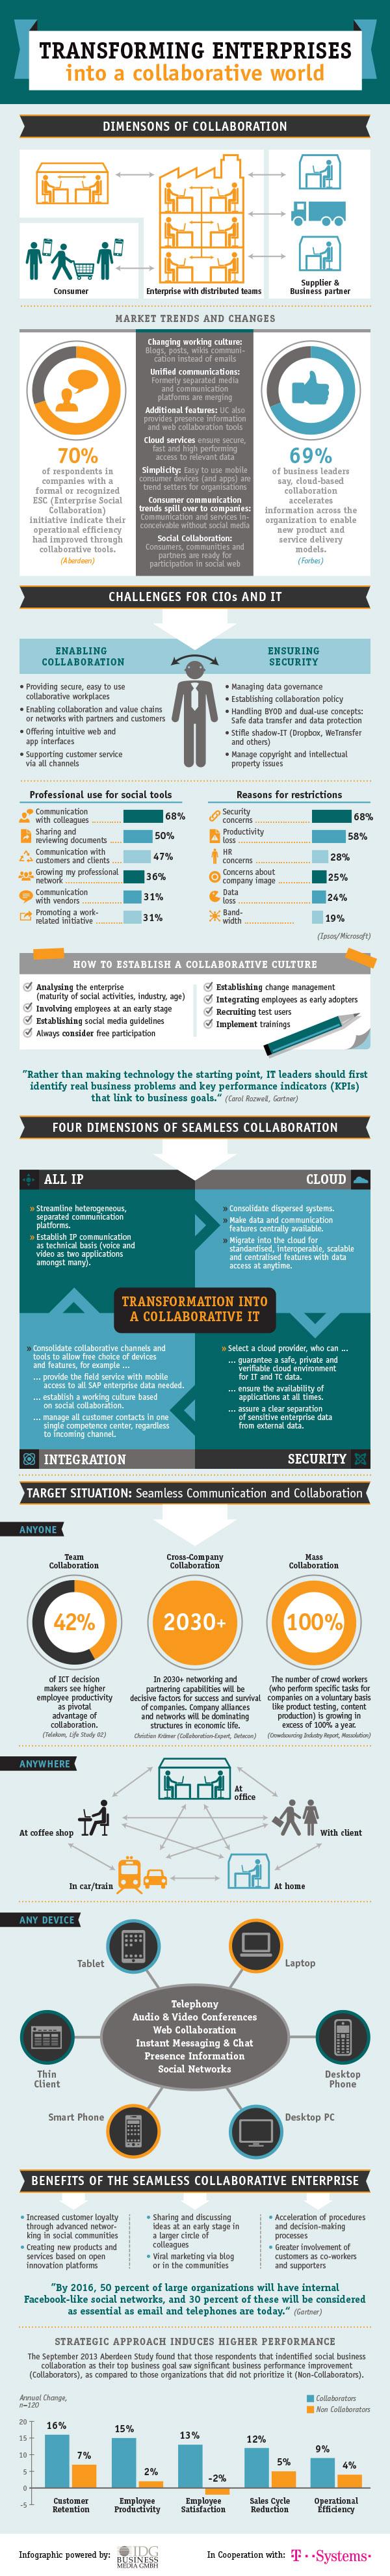 IG_Collaboration_final_eng